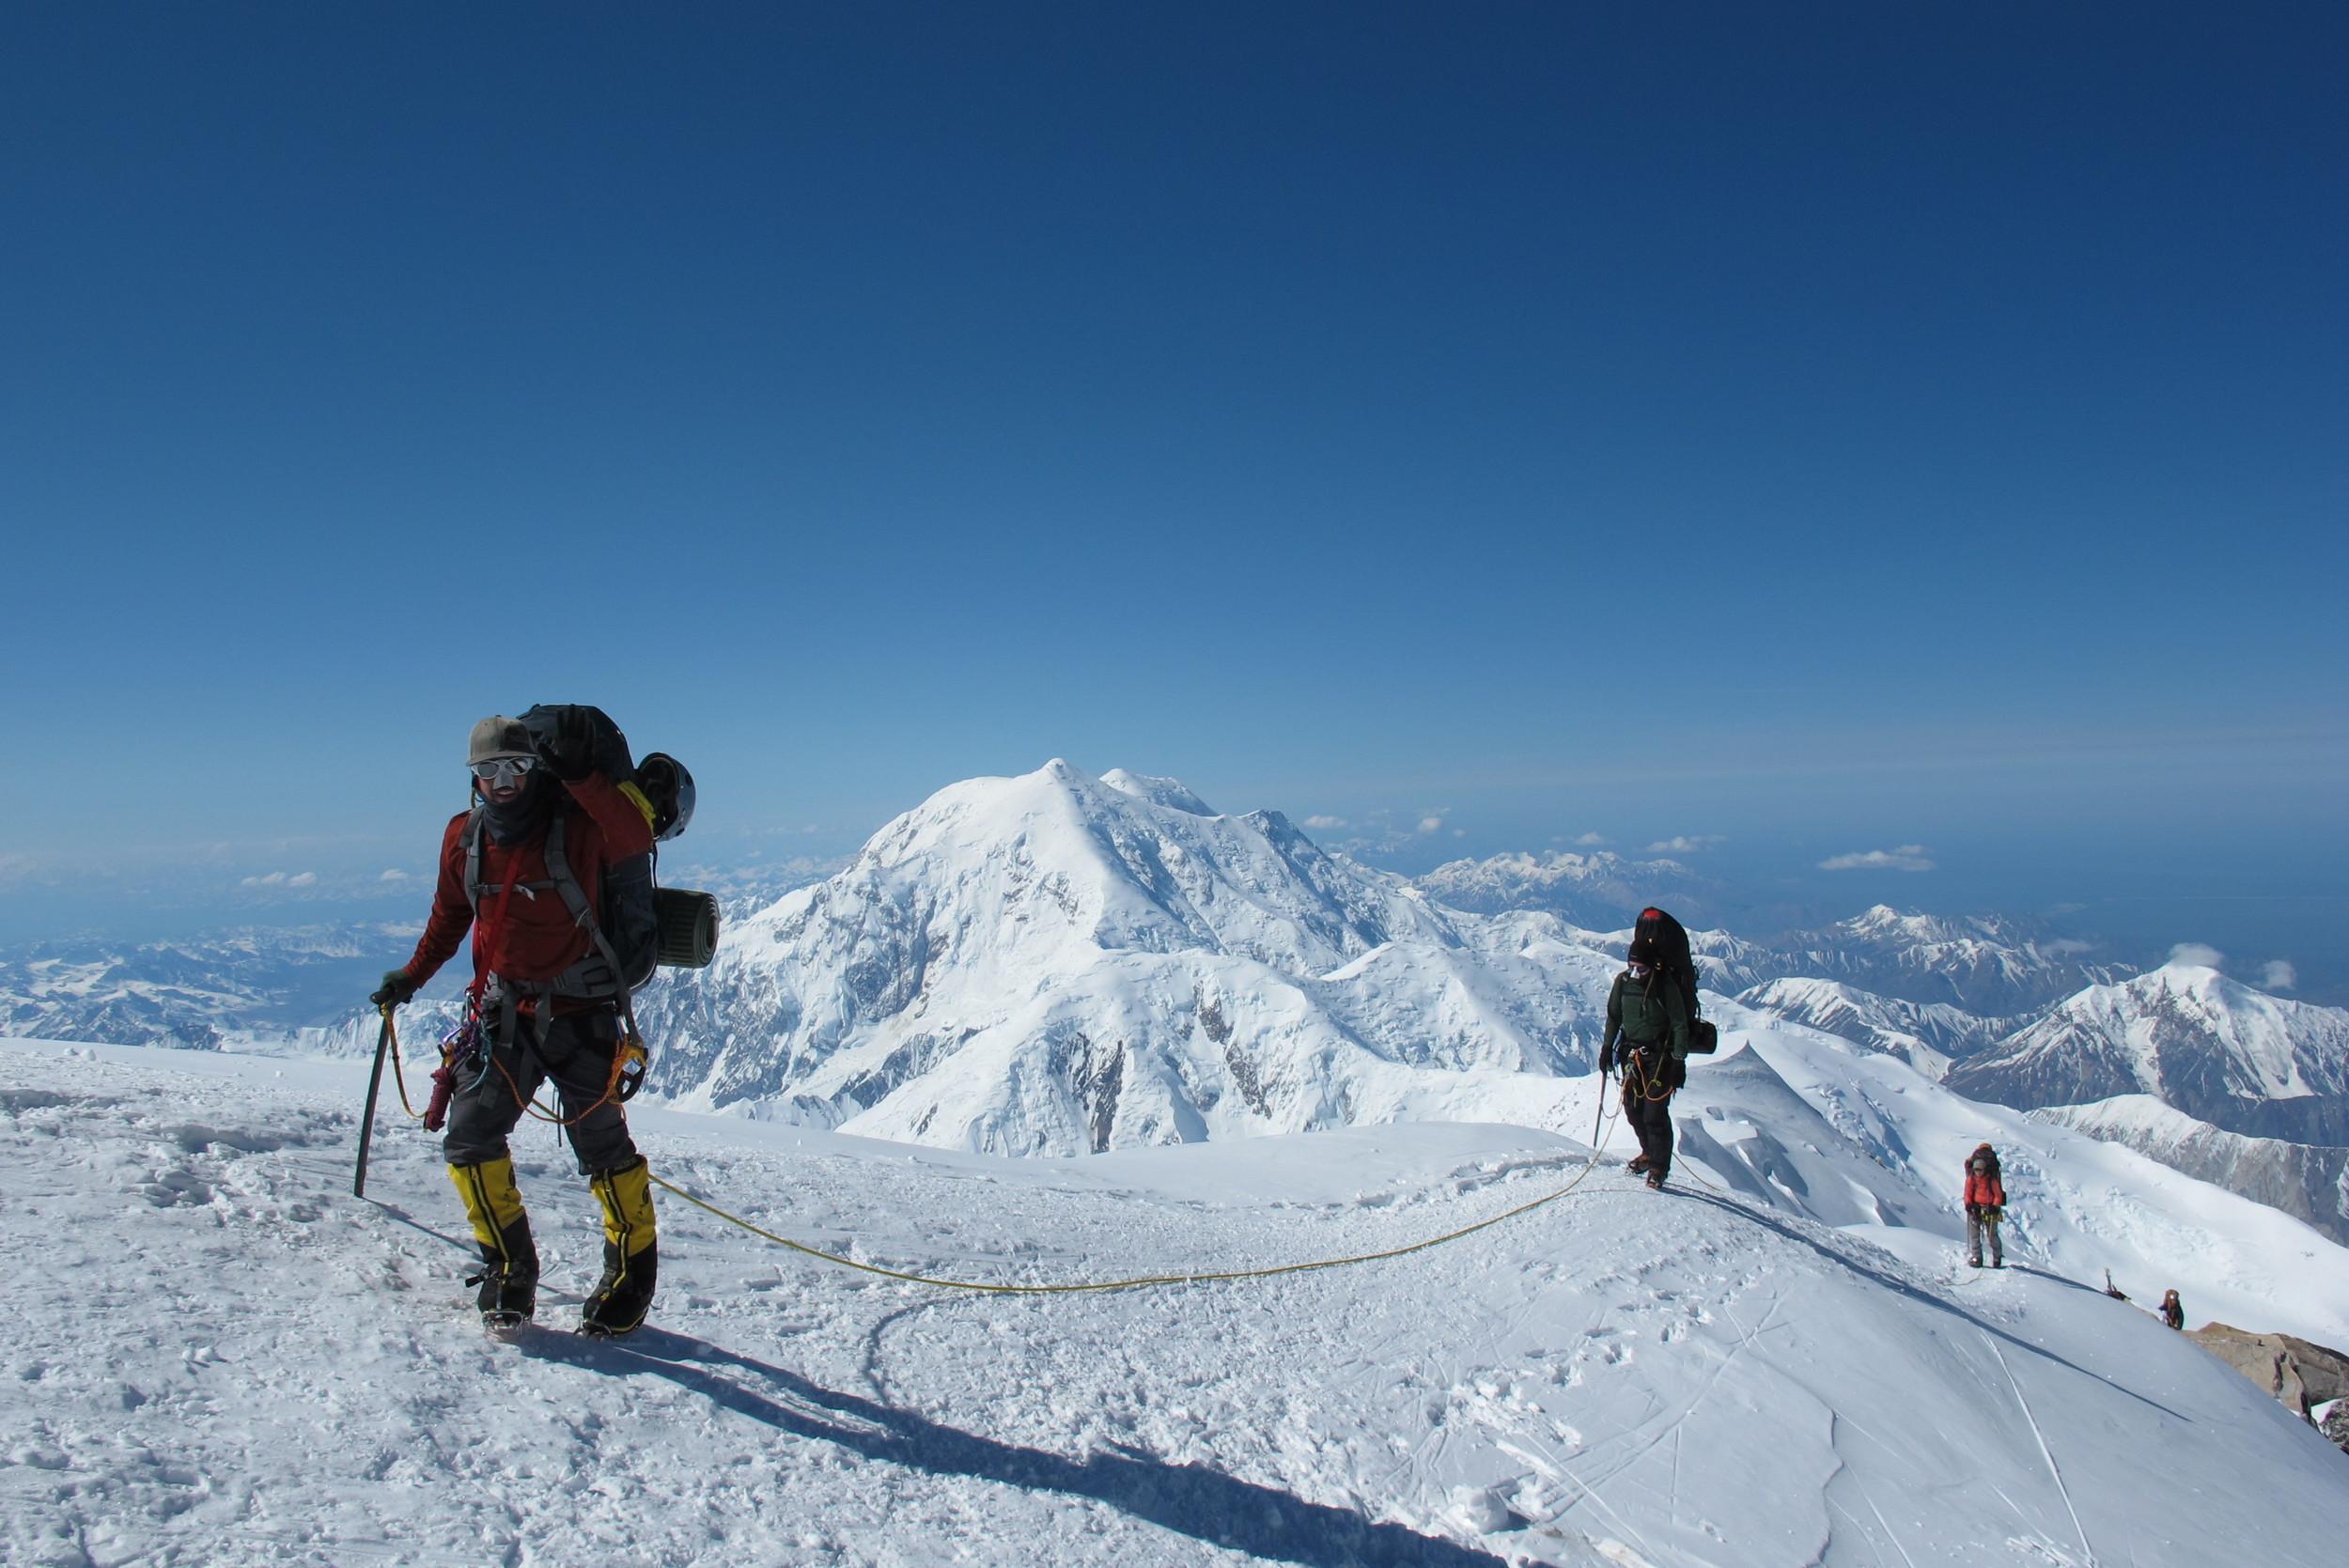 DENALI/MT. MCKINLEY PART 3: 14,000FT TO SUMMIT — Adventures of a ...